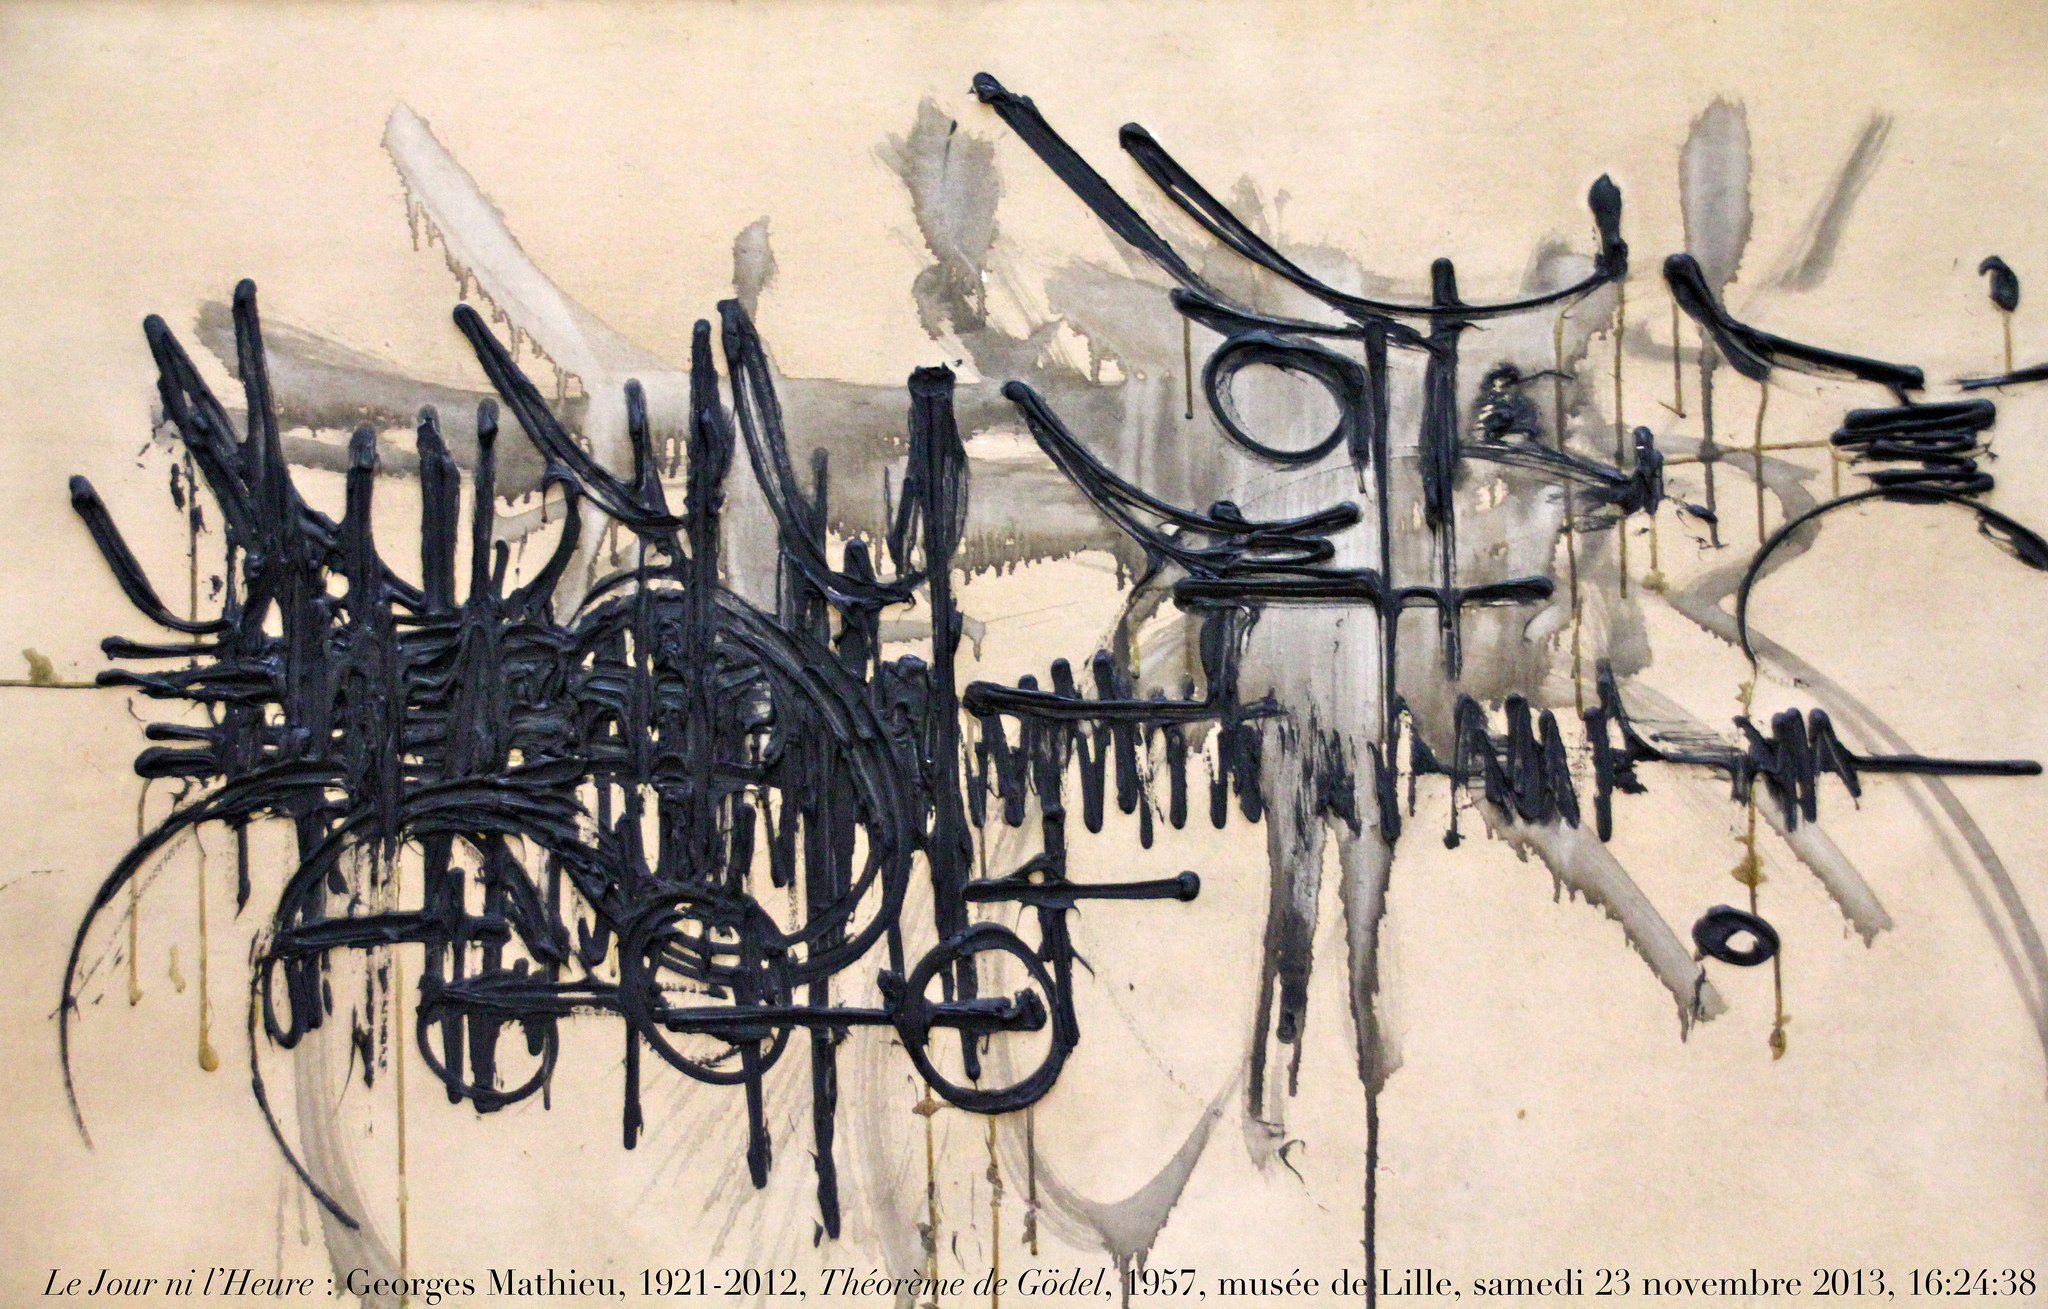 Gödel's Theorem visualised by Georges Mathieu (photo:flickr/renaud-camus)